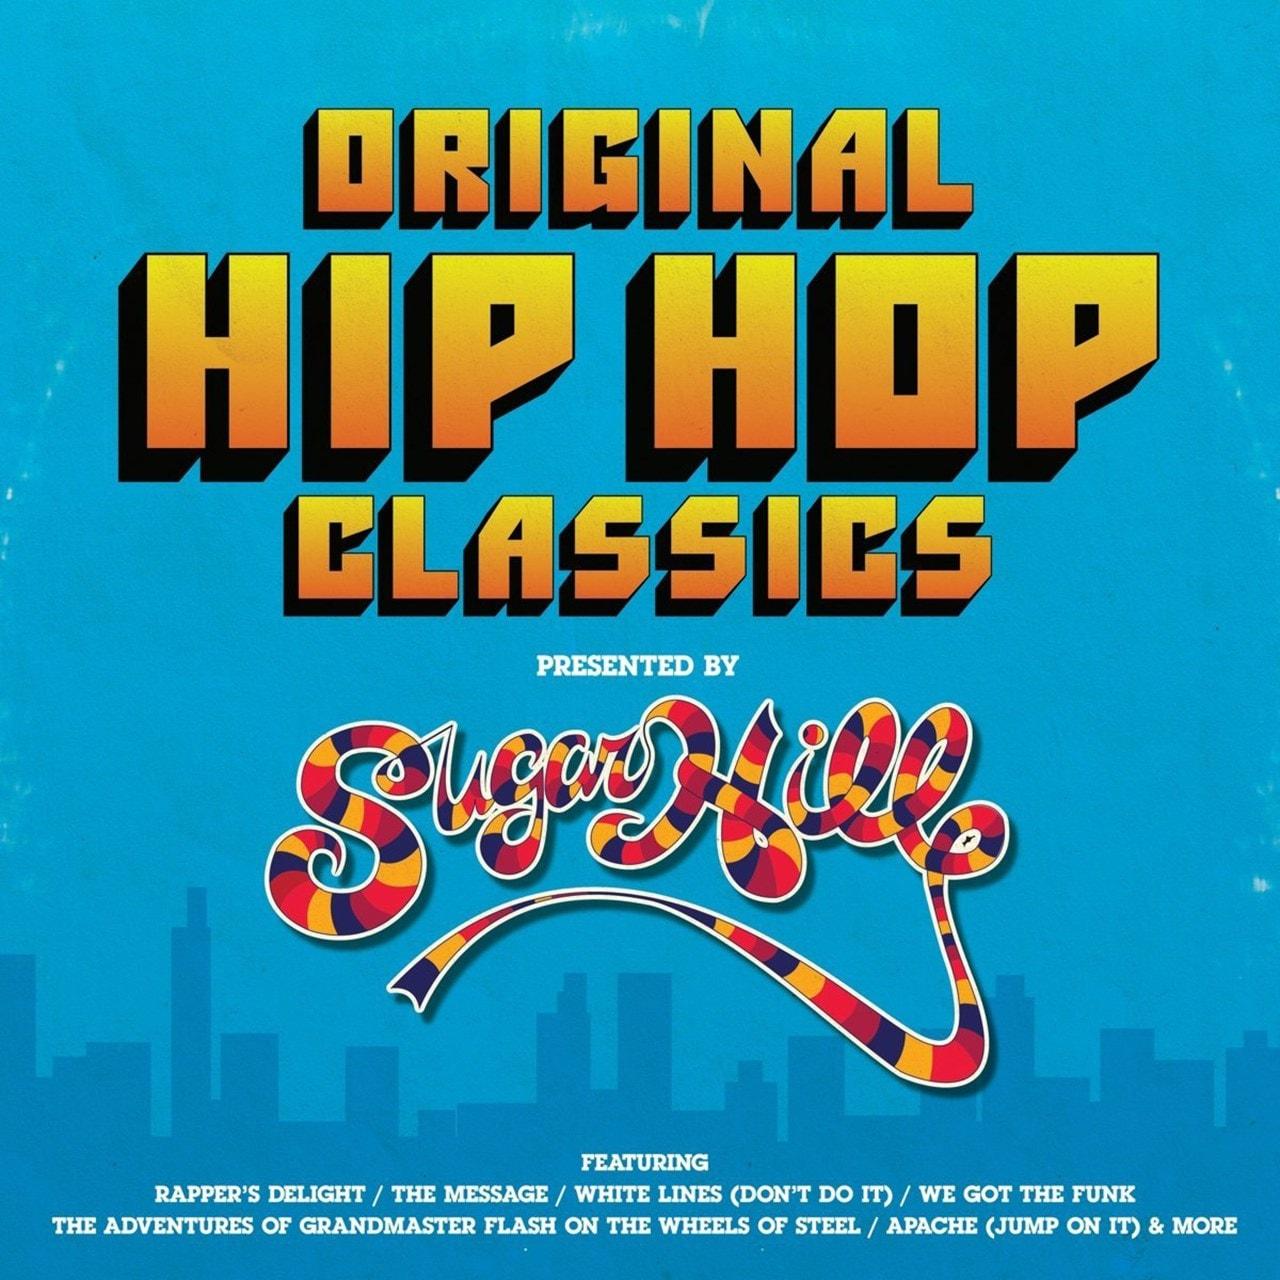 Original Hip Hop Classics Presented By Sugar Hill Records - 1